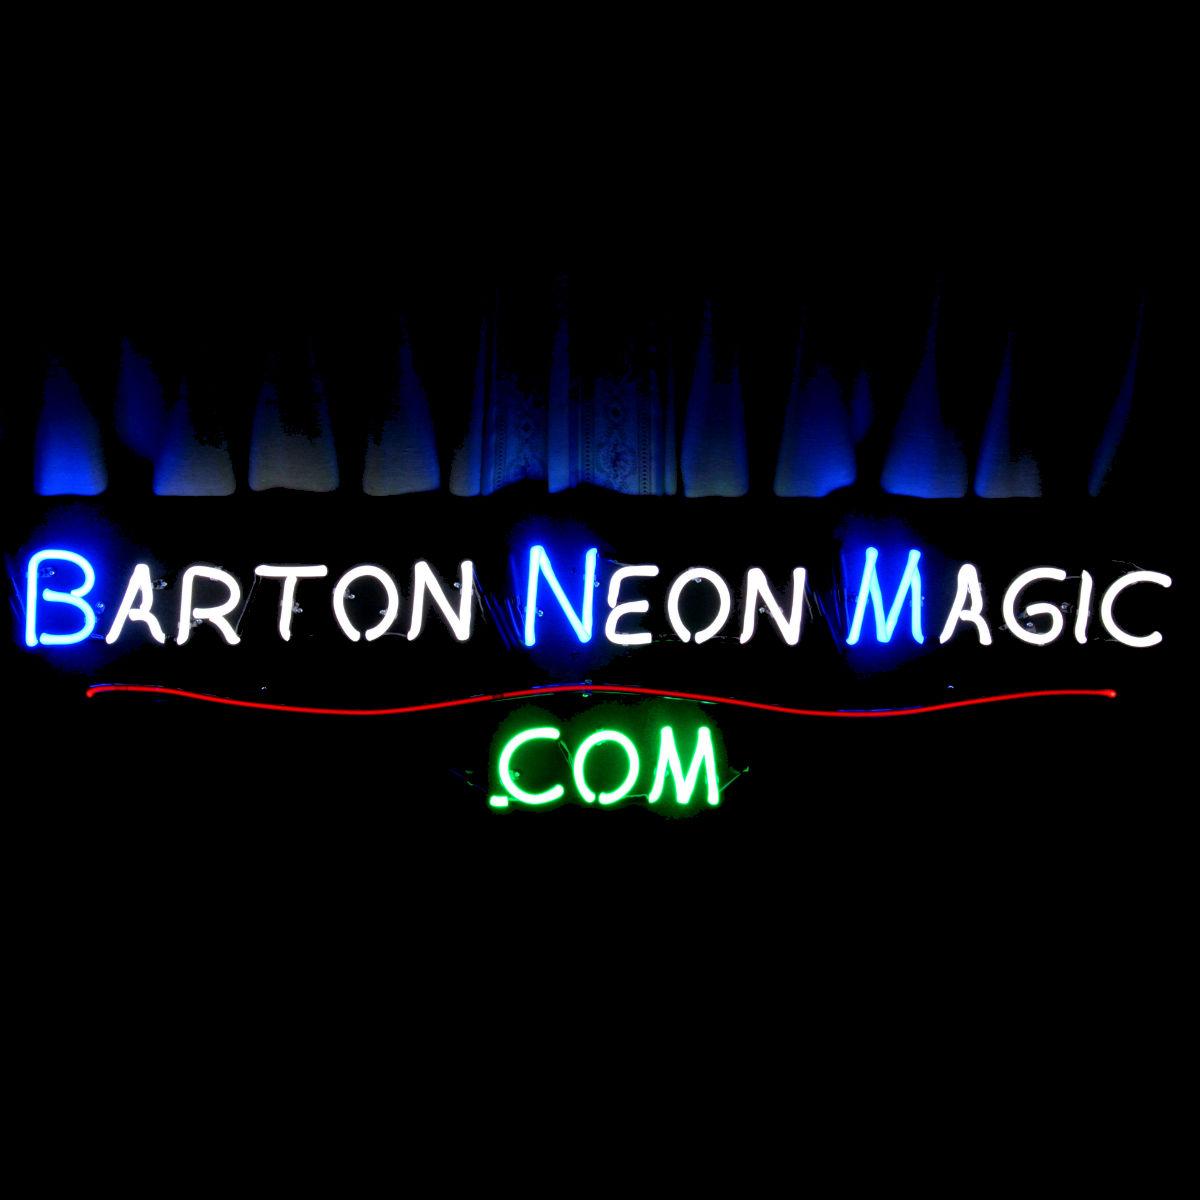 Brilliant Custom Neon Chandeliers by John Barton - Famous USA Neon Glass Artist - BartonNeonMagic.com